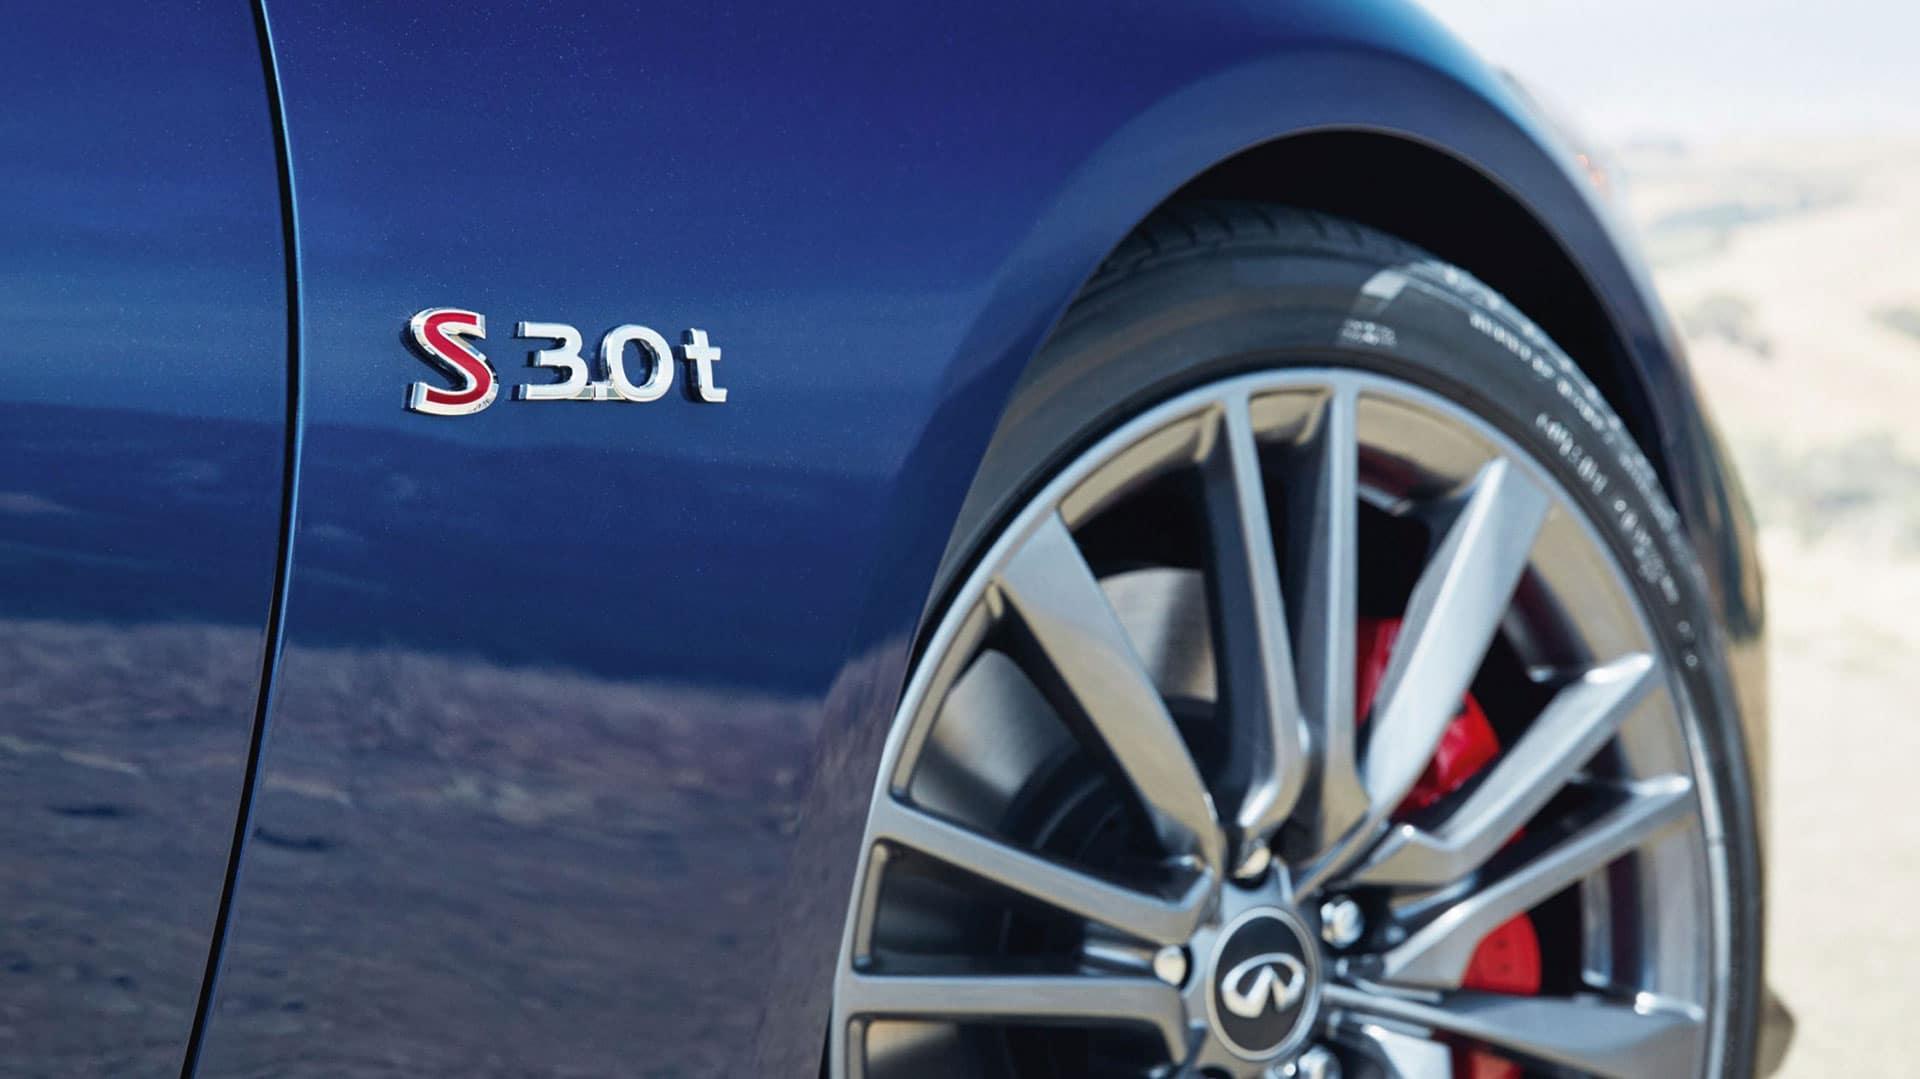 2019-infiniti-q50-wheel